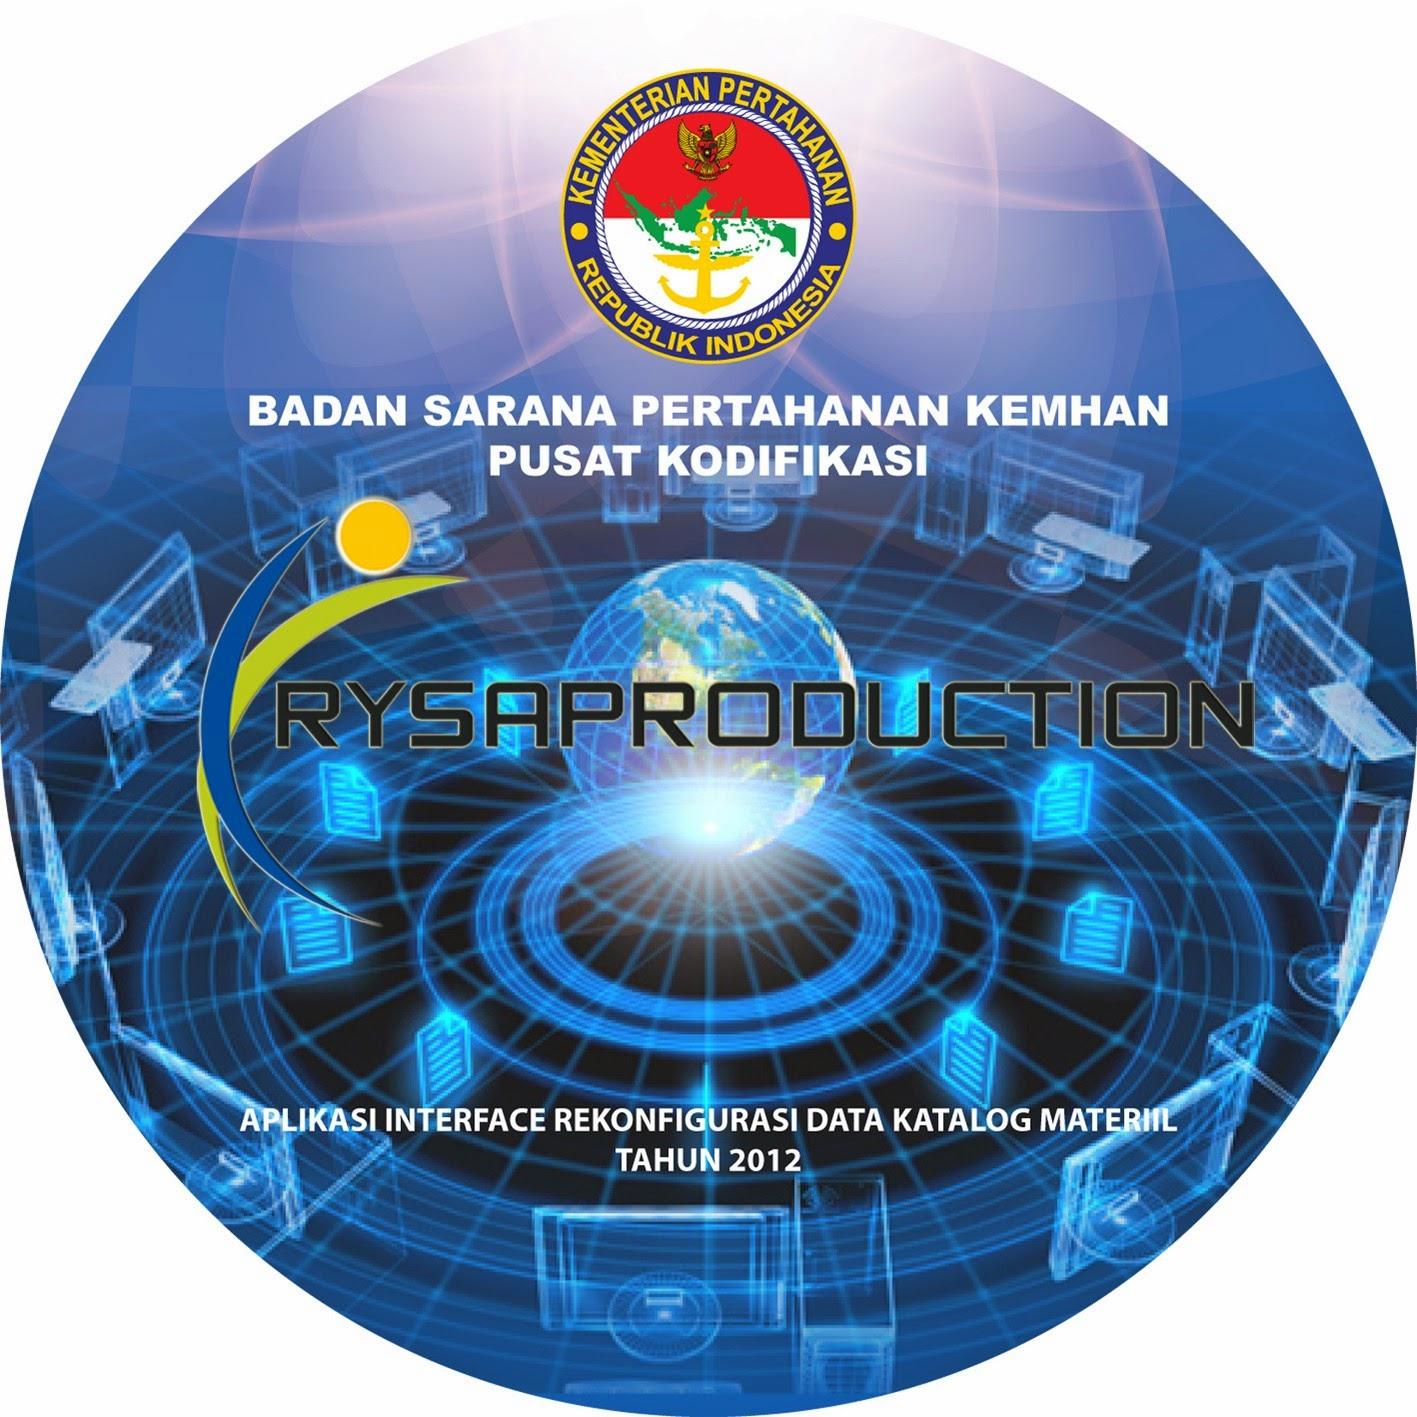 Kementrian Pertahanan Republik Indonesia